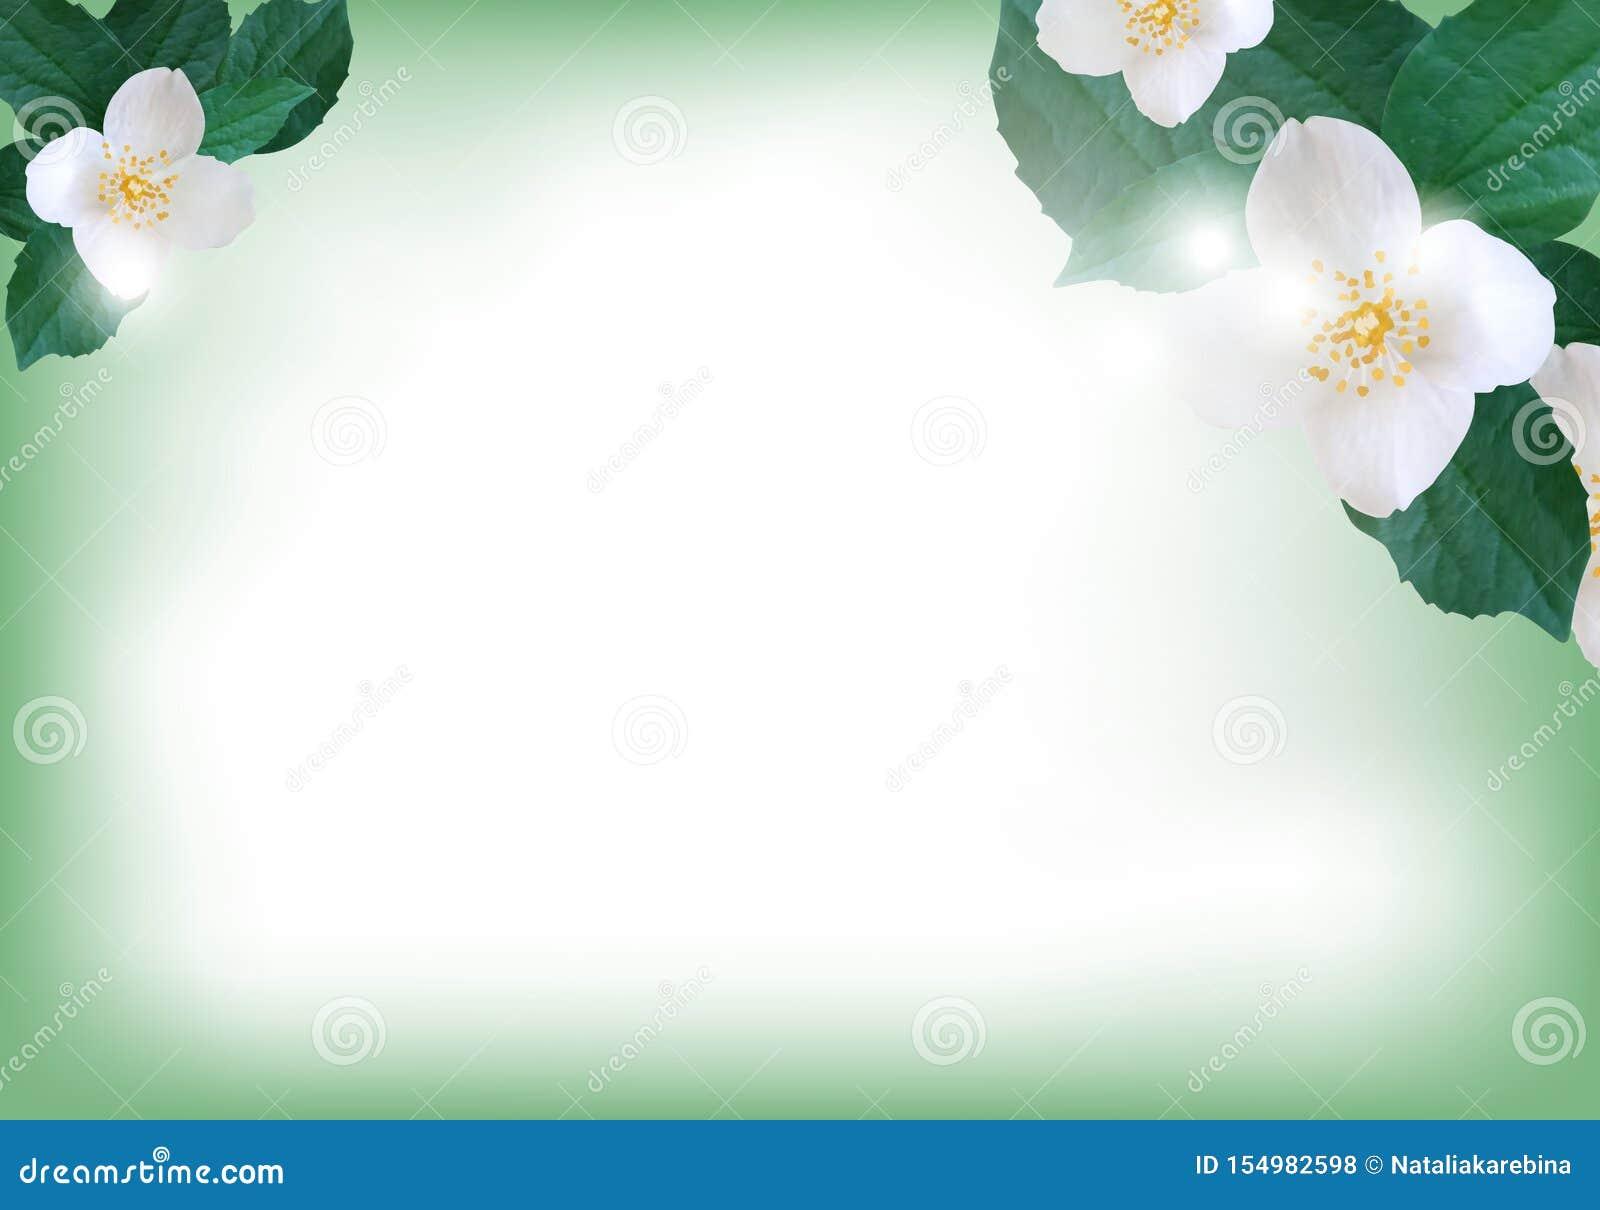 Flowers Jasmine Elegant Background For Greeting Card Or